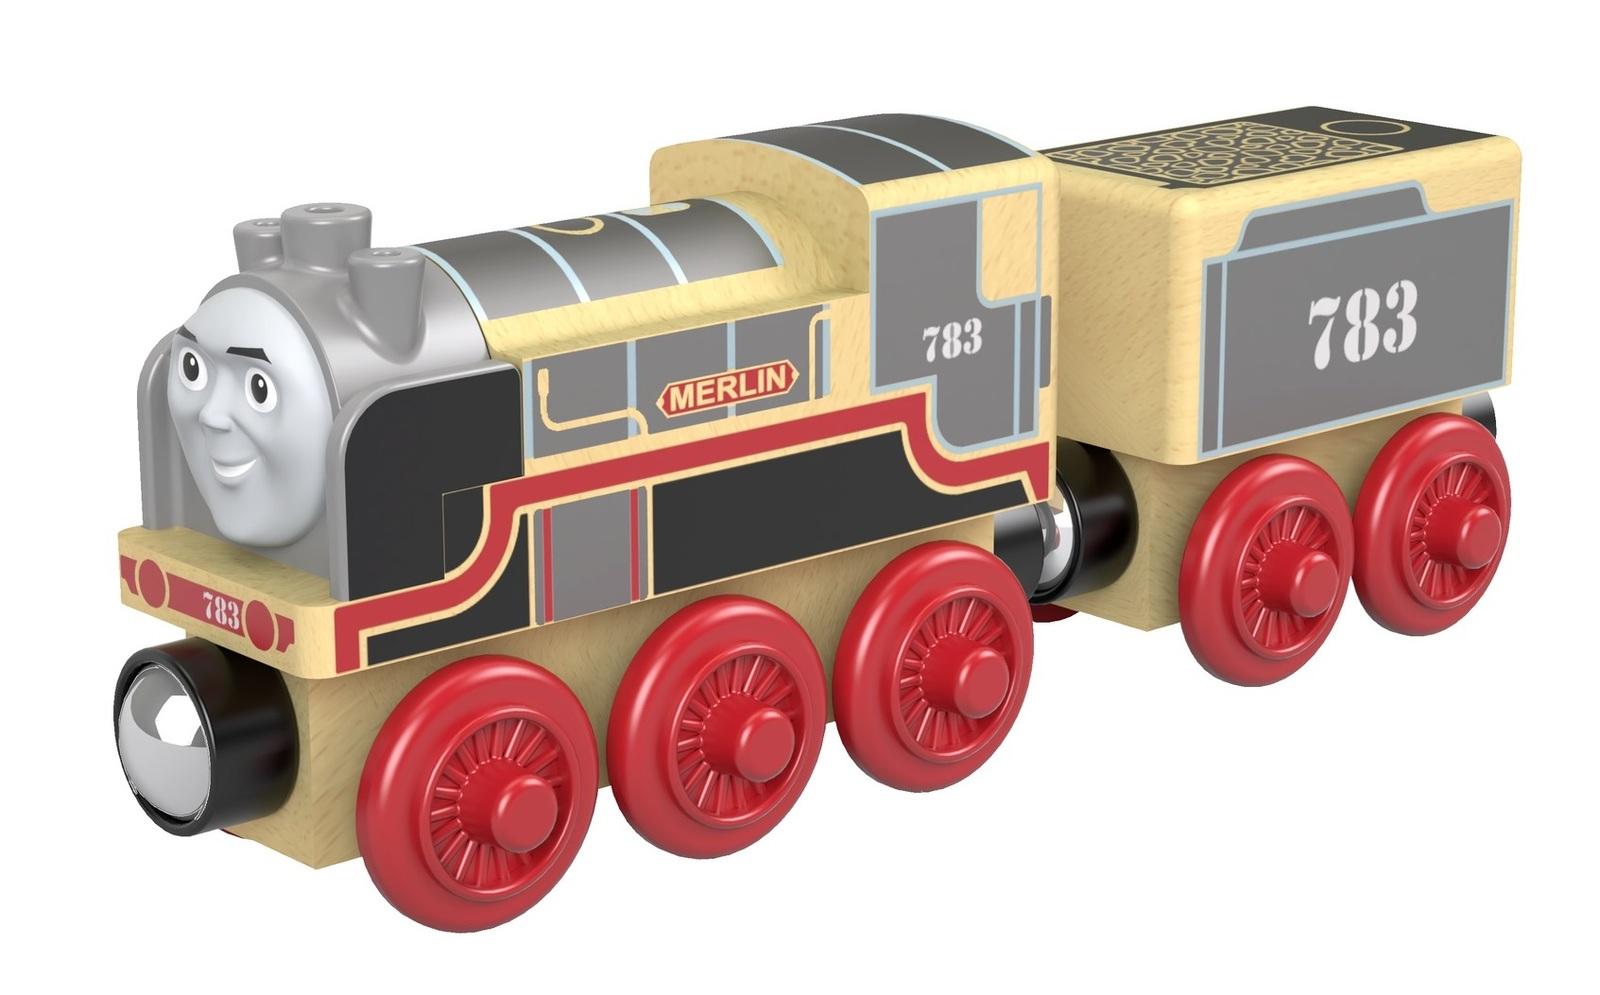 Thomas & Friends: Wooden Railway Large - Merlin image